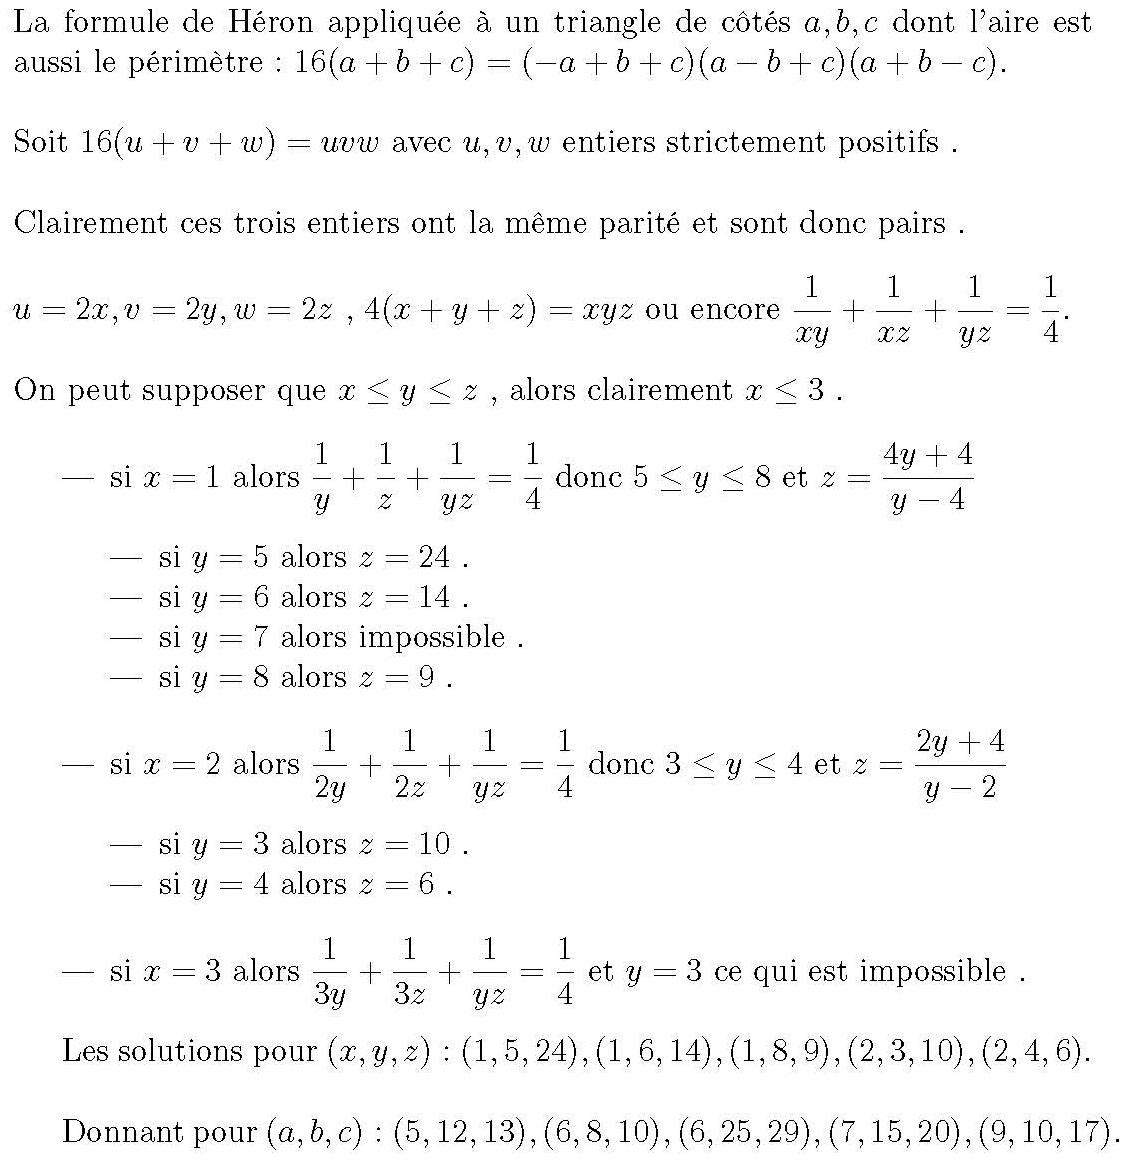 http://www.prise2tete.fr/upload/Vasimolo-Perimetre=Aire.jpg